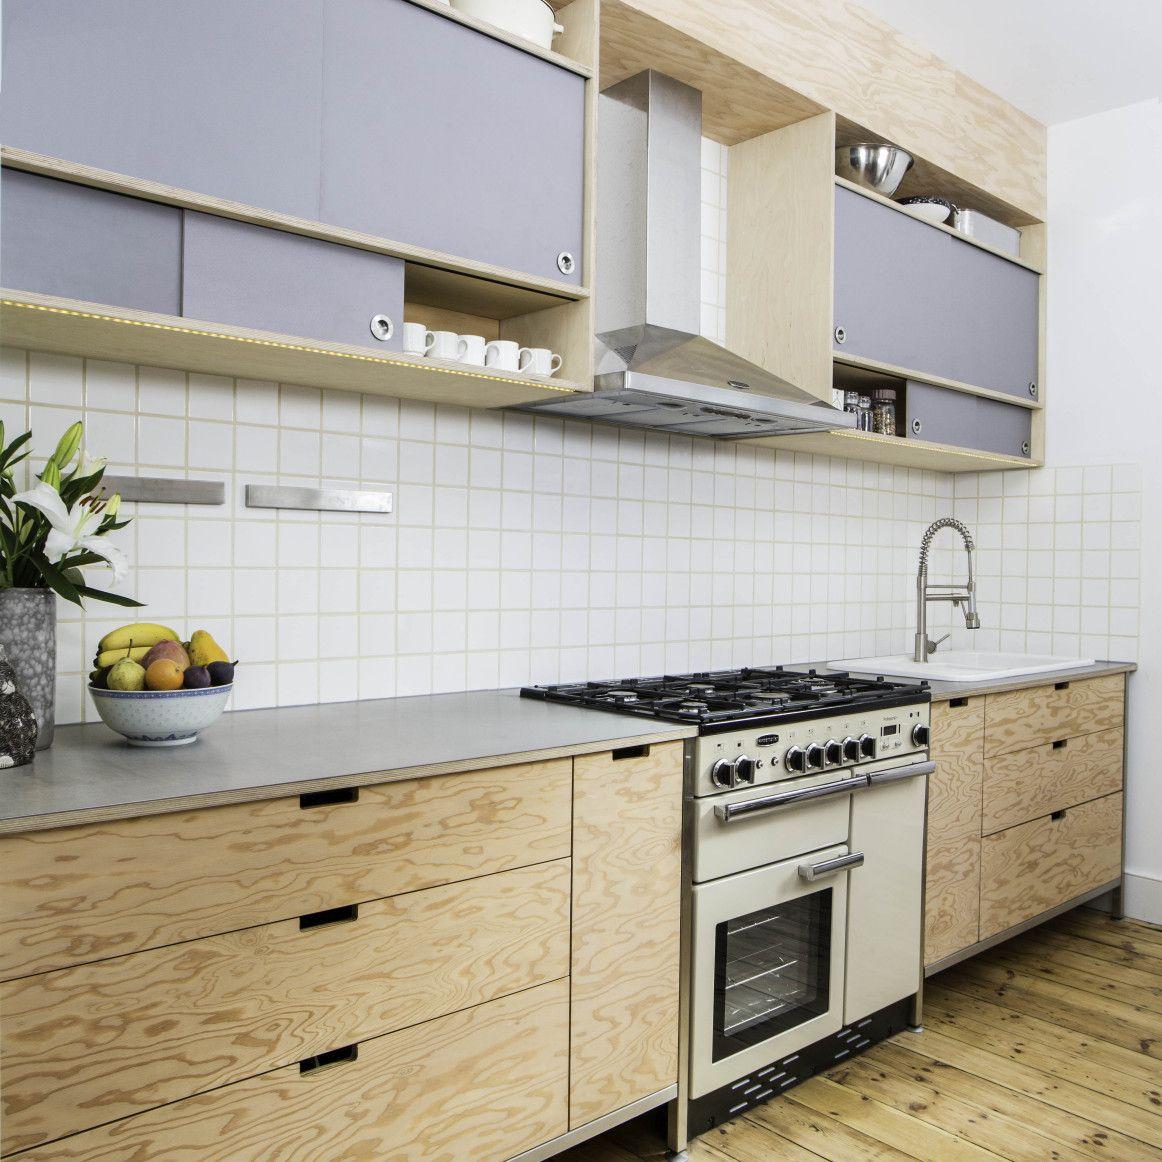 douglas fir kitchen worktops - Google Search | Kitchen | Pinterest ...